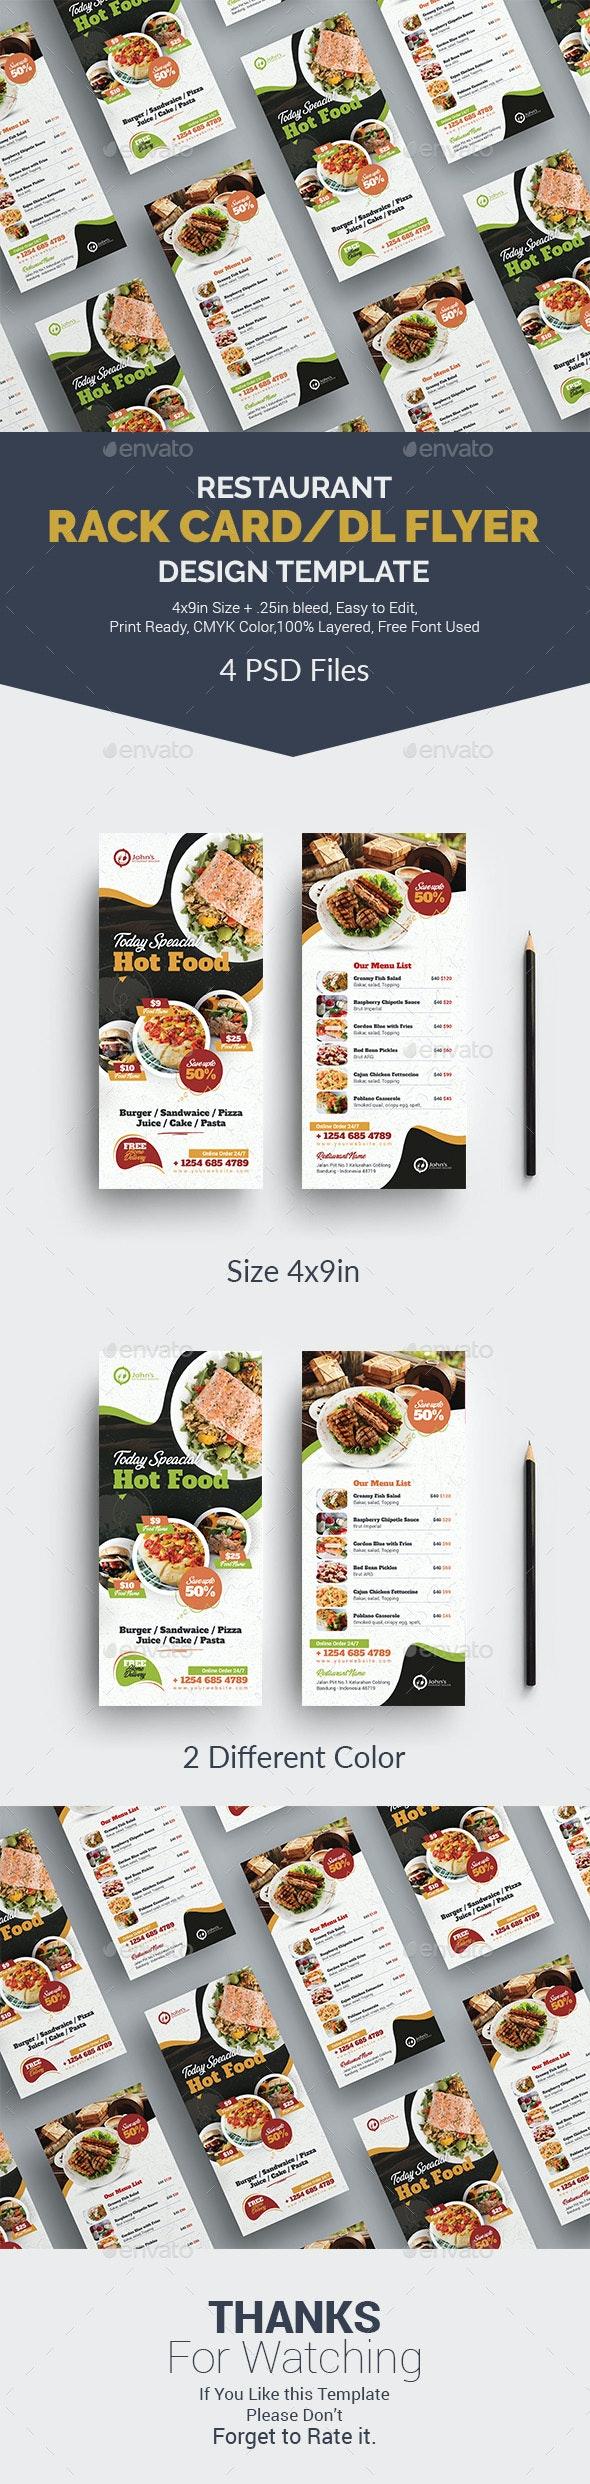 Rack Card / DL Flyer - Restaurant Flyers